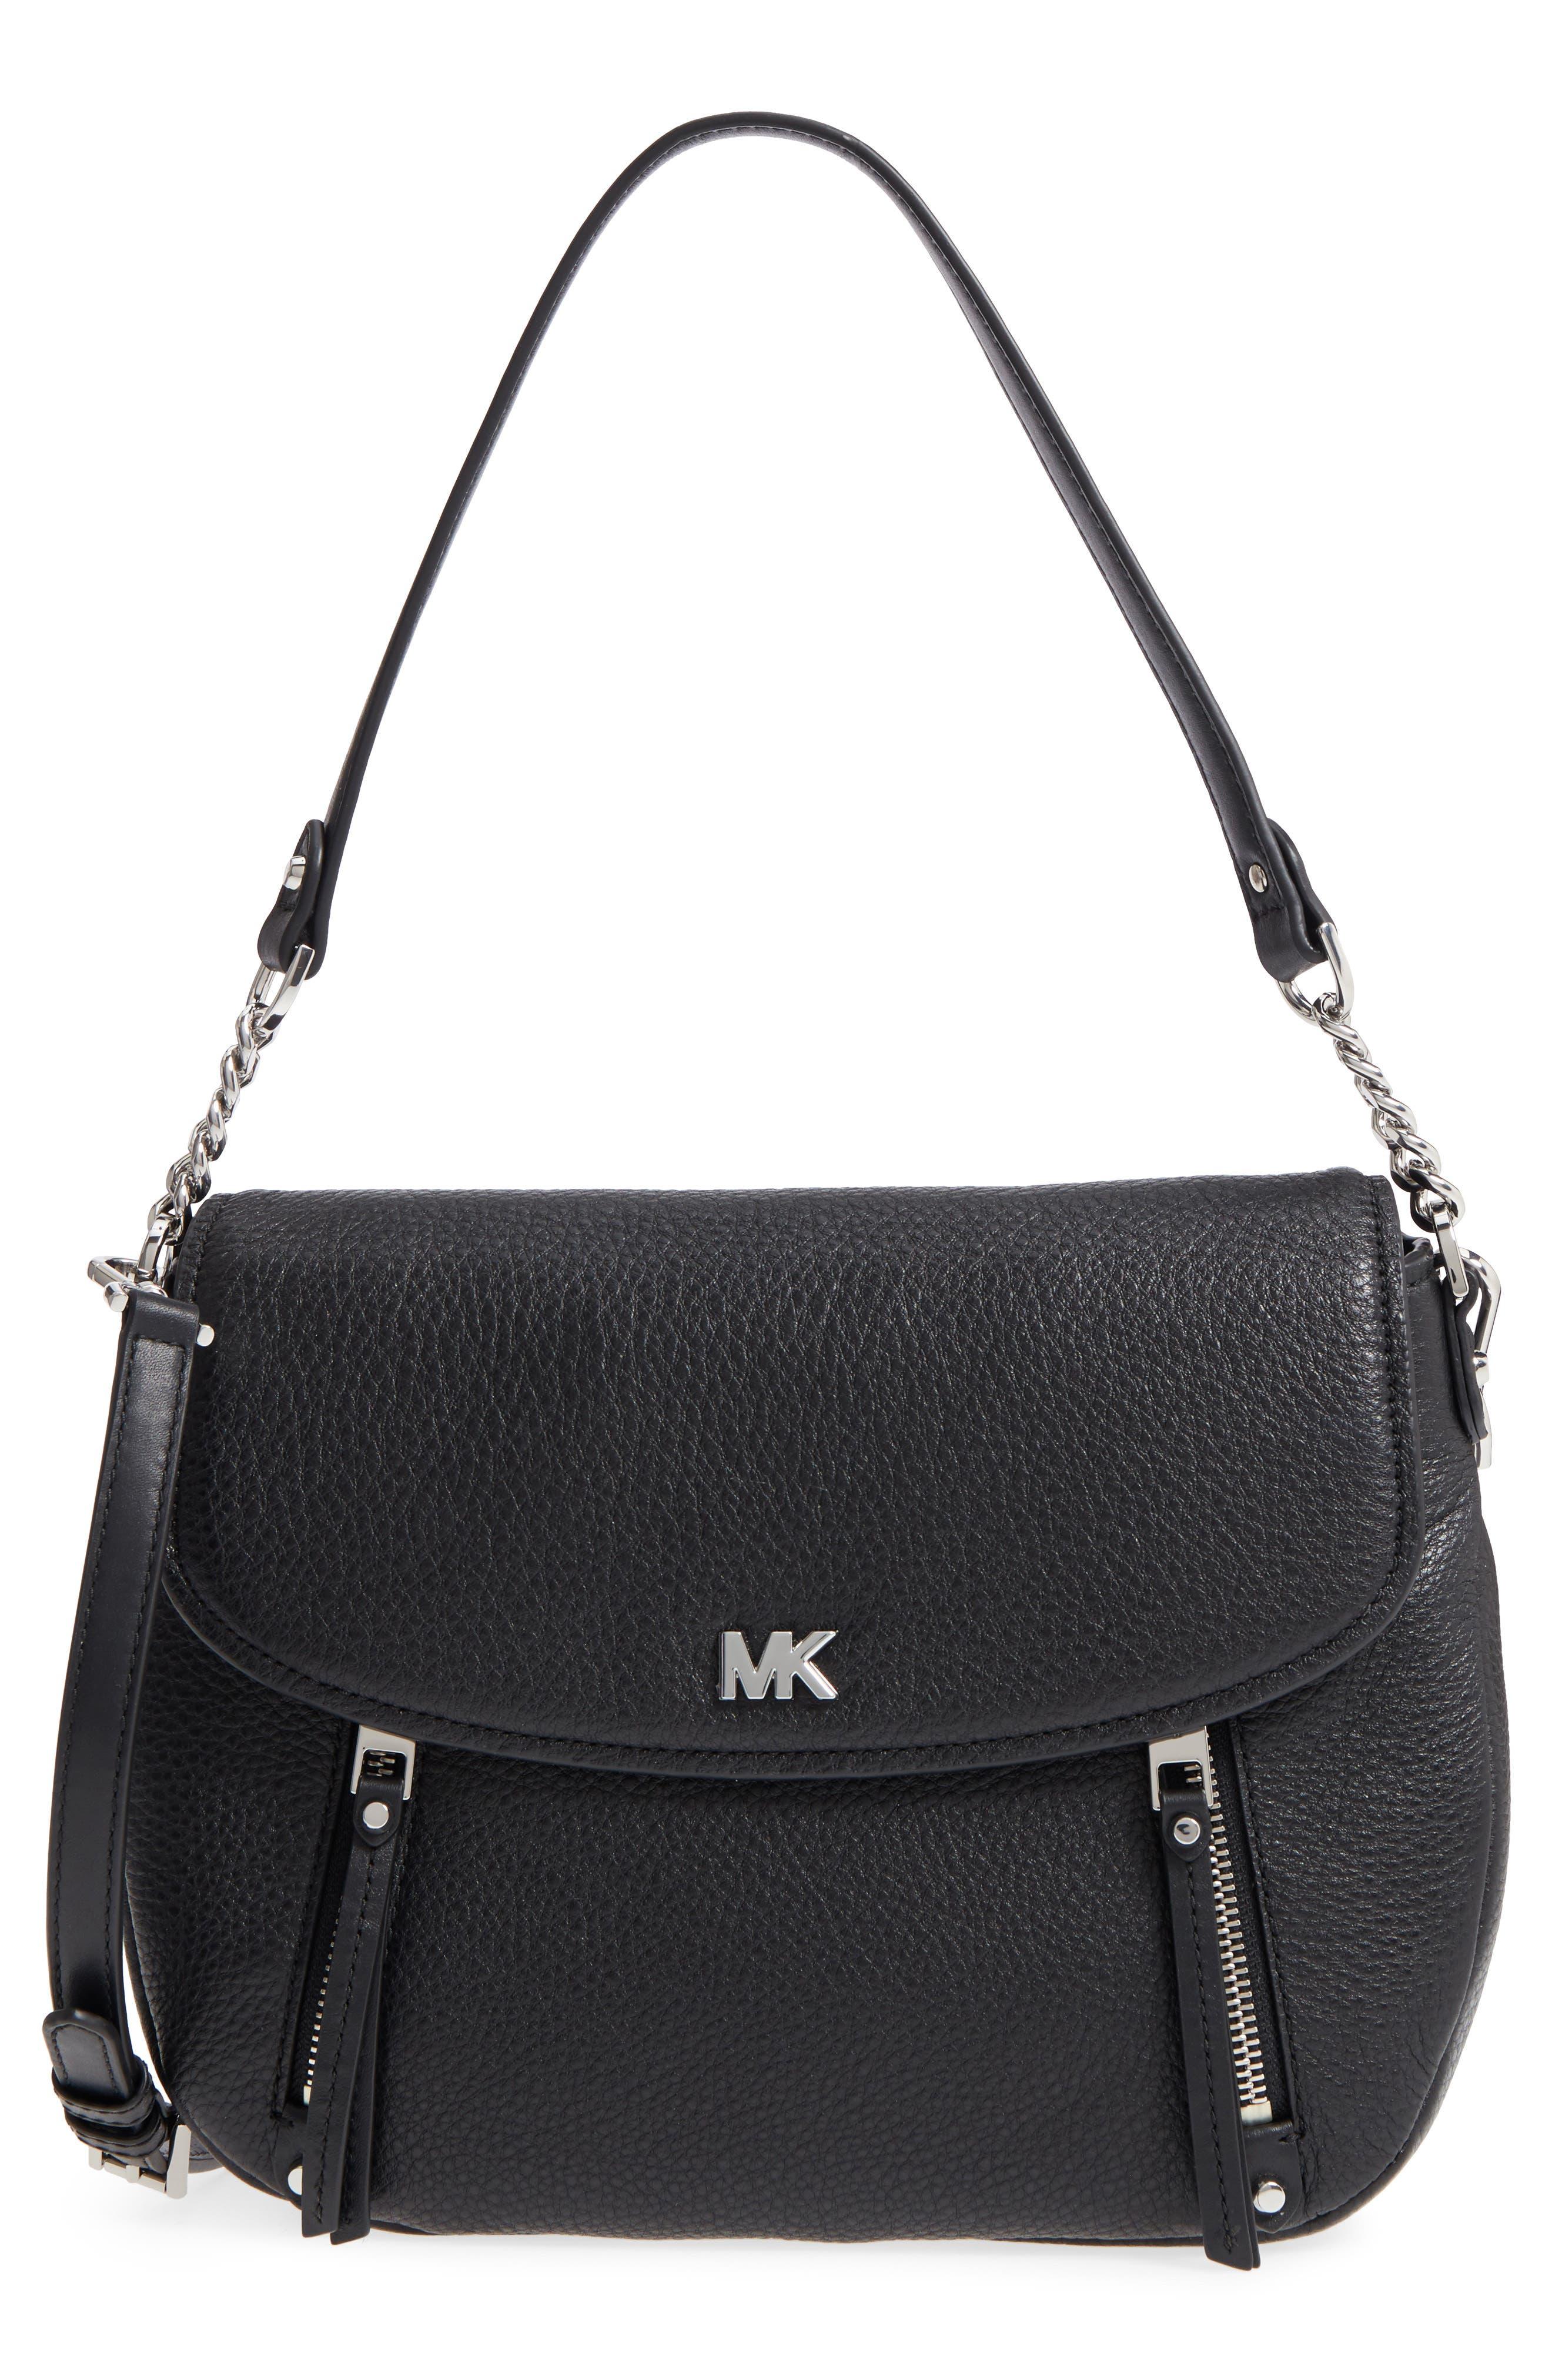 Medium Leather Shoulder Bag,                             Main thumbnail 1, color,                             001